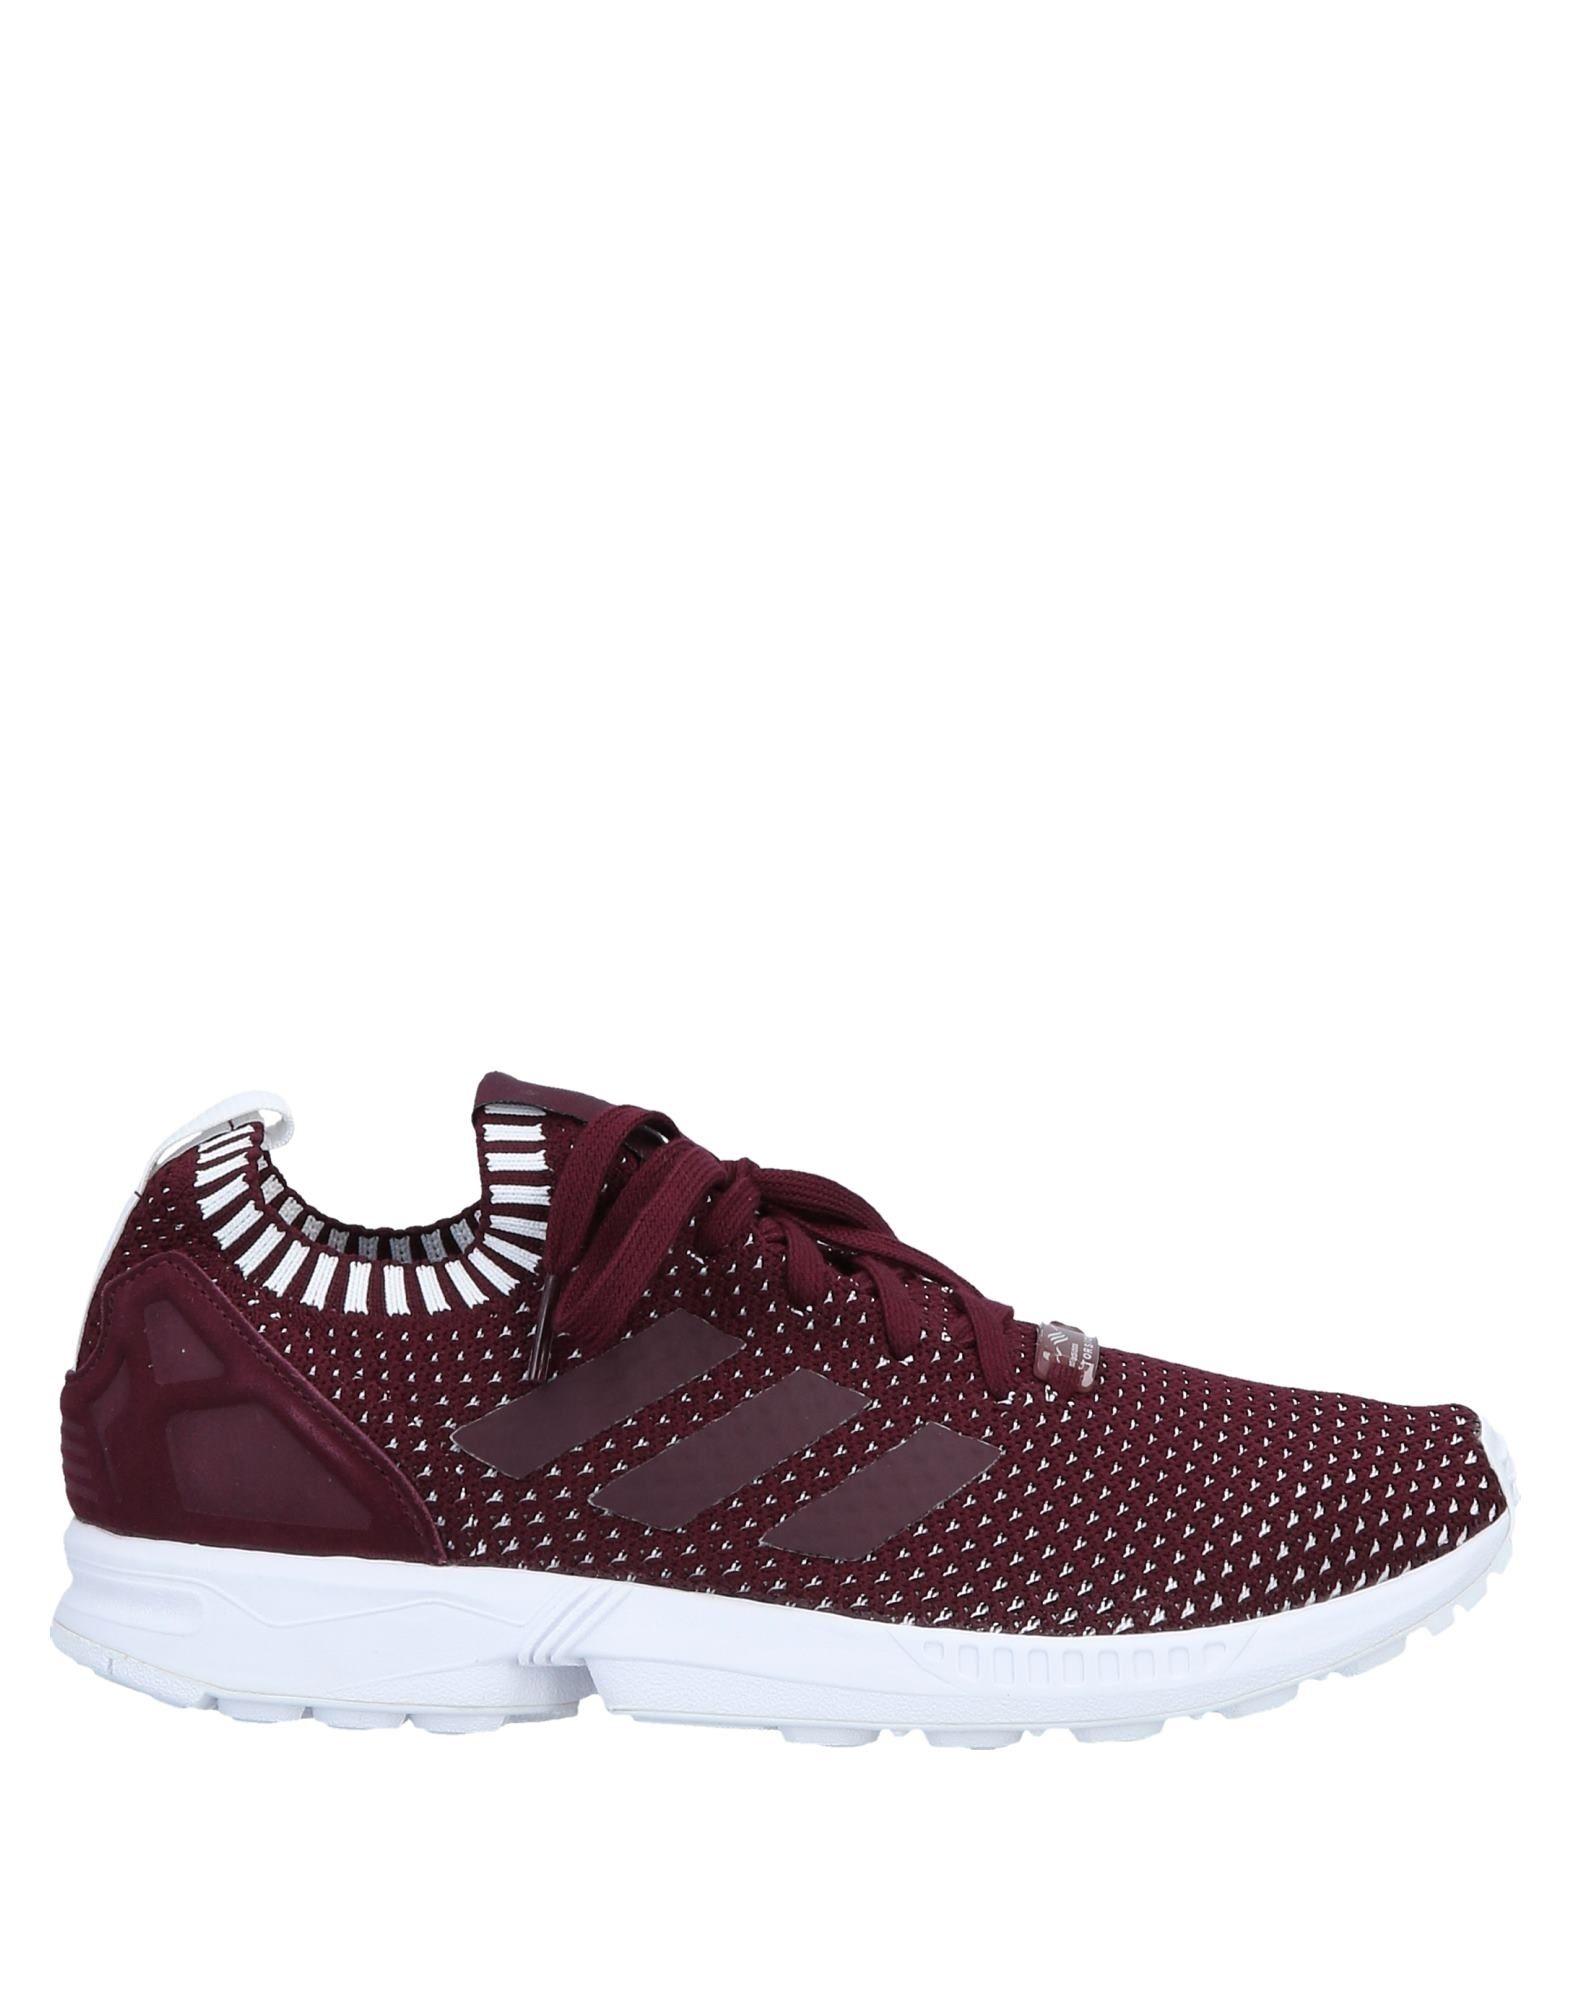 Adidas Originals Sneakers - Women Adidas Originals Sneakers - online on  Canada - Sneakers 11560855AN f8947b